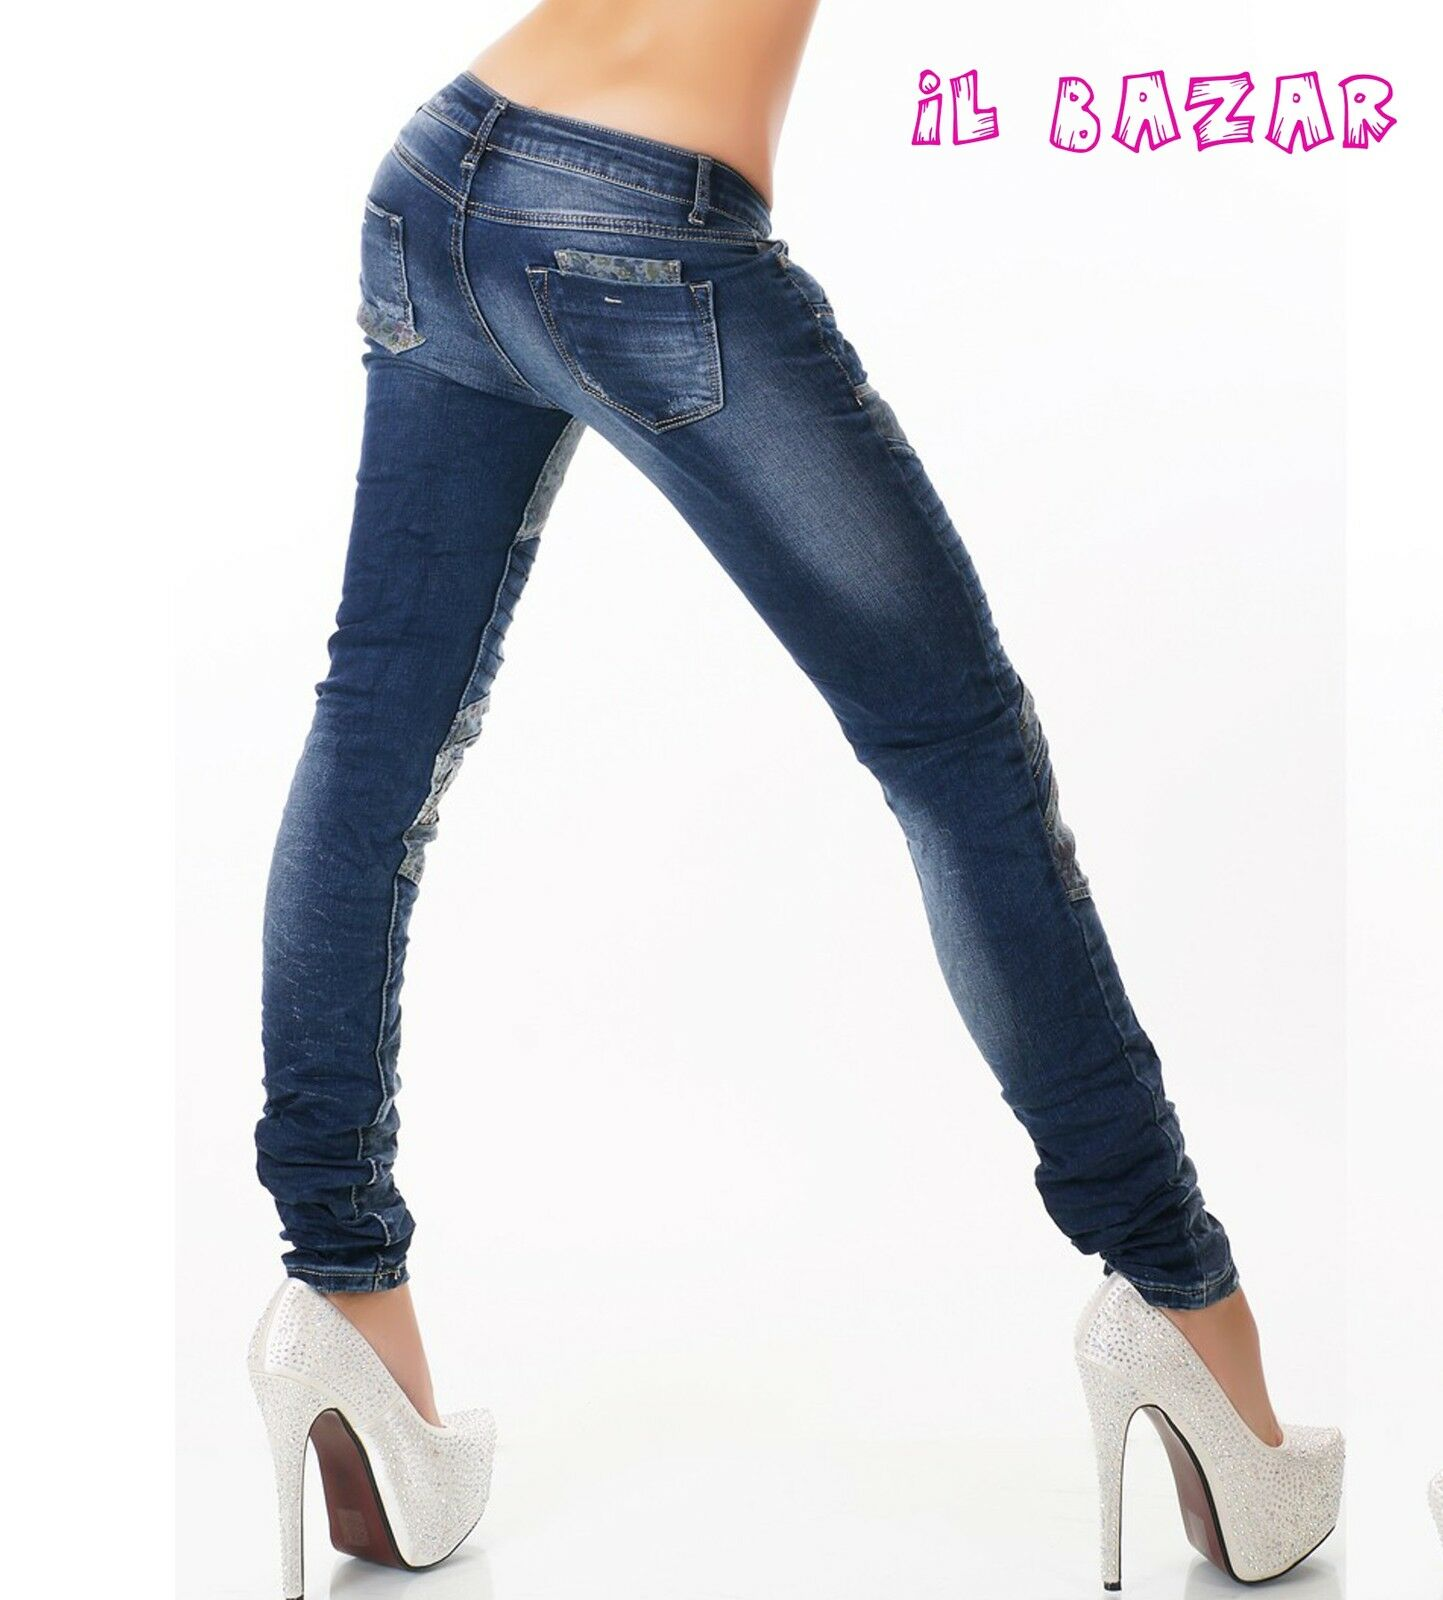 jeans patchwork Skinny Skinny Skinny inserti florealie trapuntati tg XS,S,M,L,XL 670af9